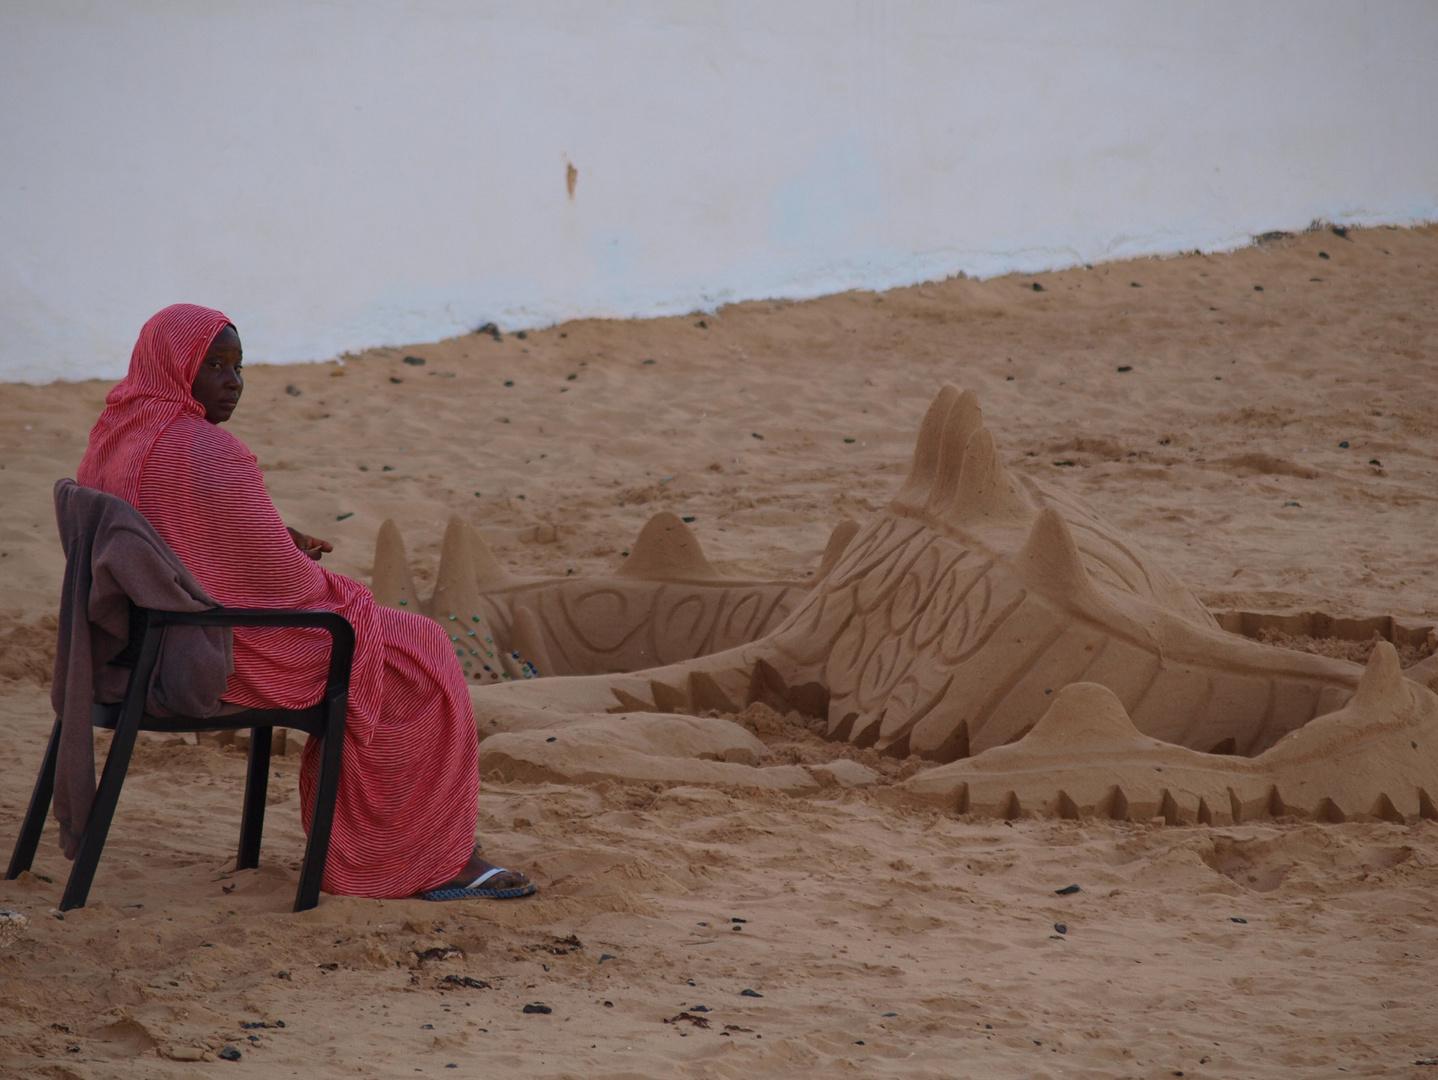 Drachenfrau am Strand